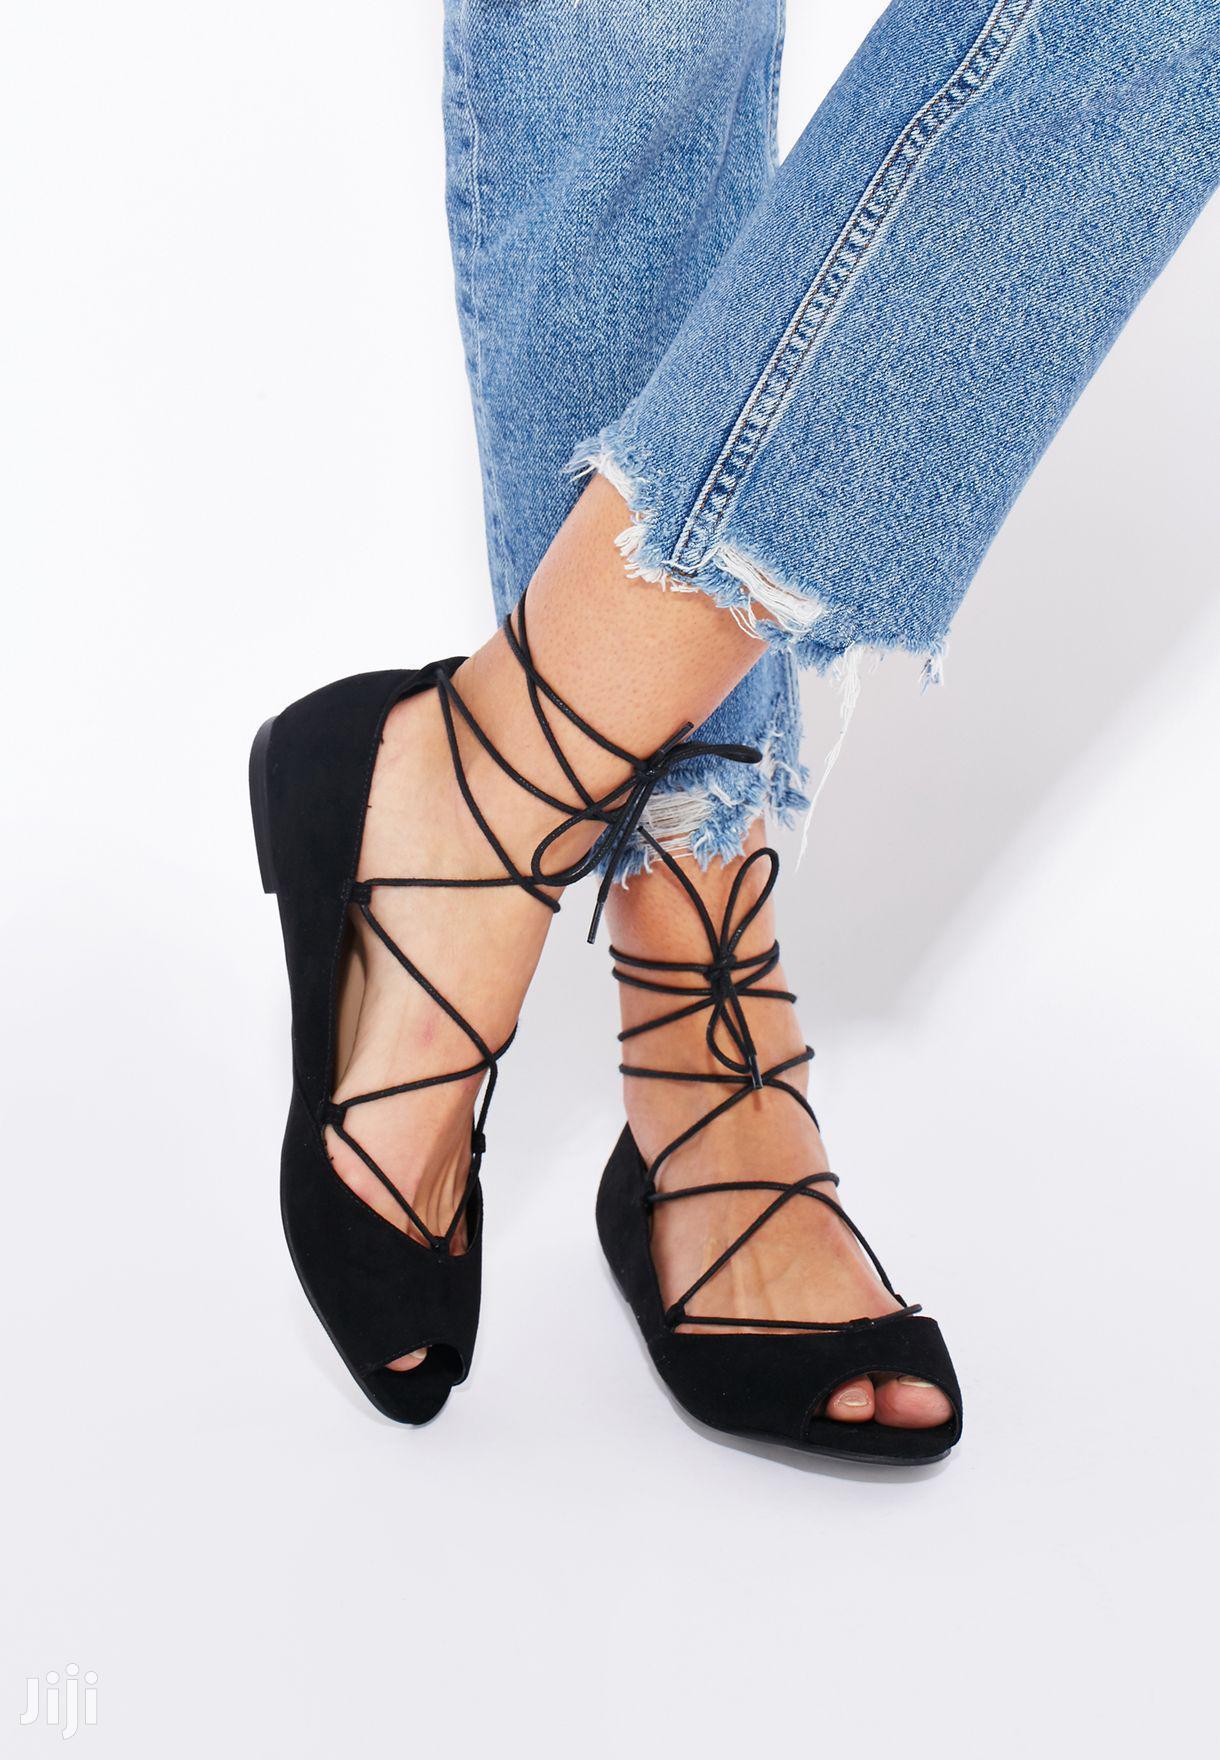 Bole - Shoes, Nebil Omer | Jiji